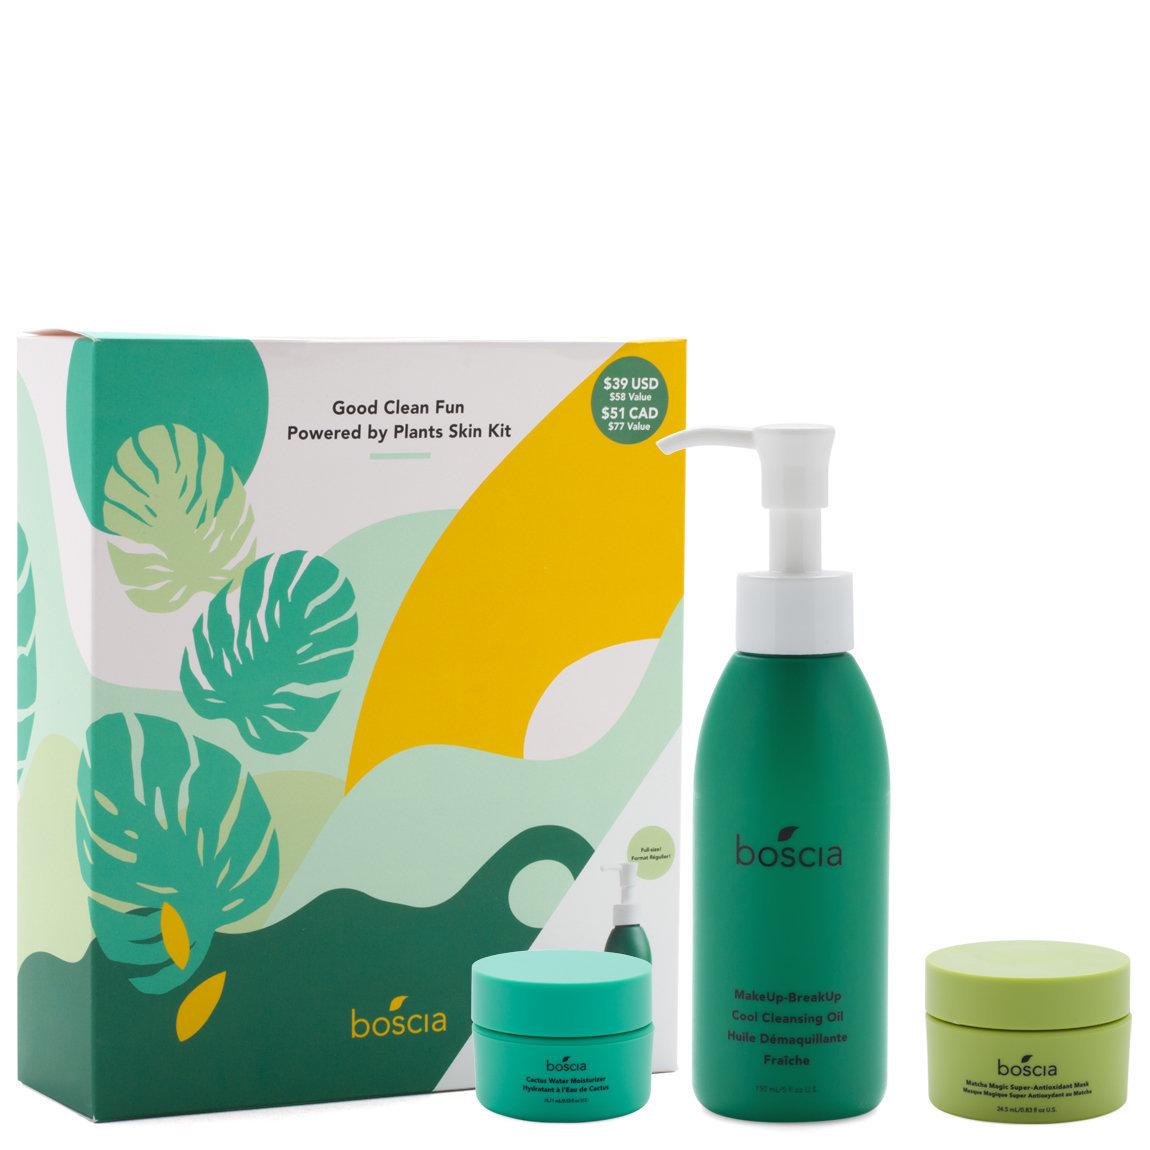 boscia Good Clean Fun - Powered By Plants Skin Kit